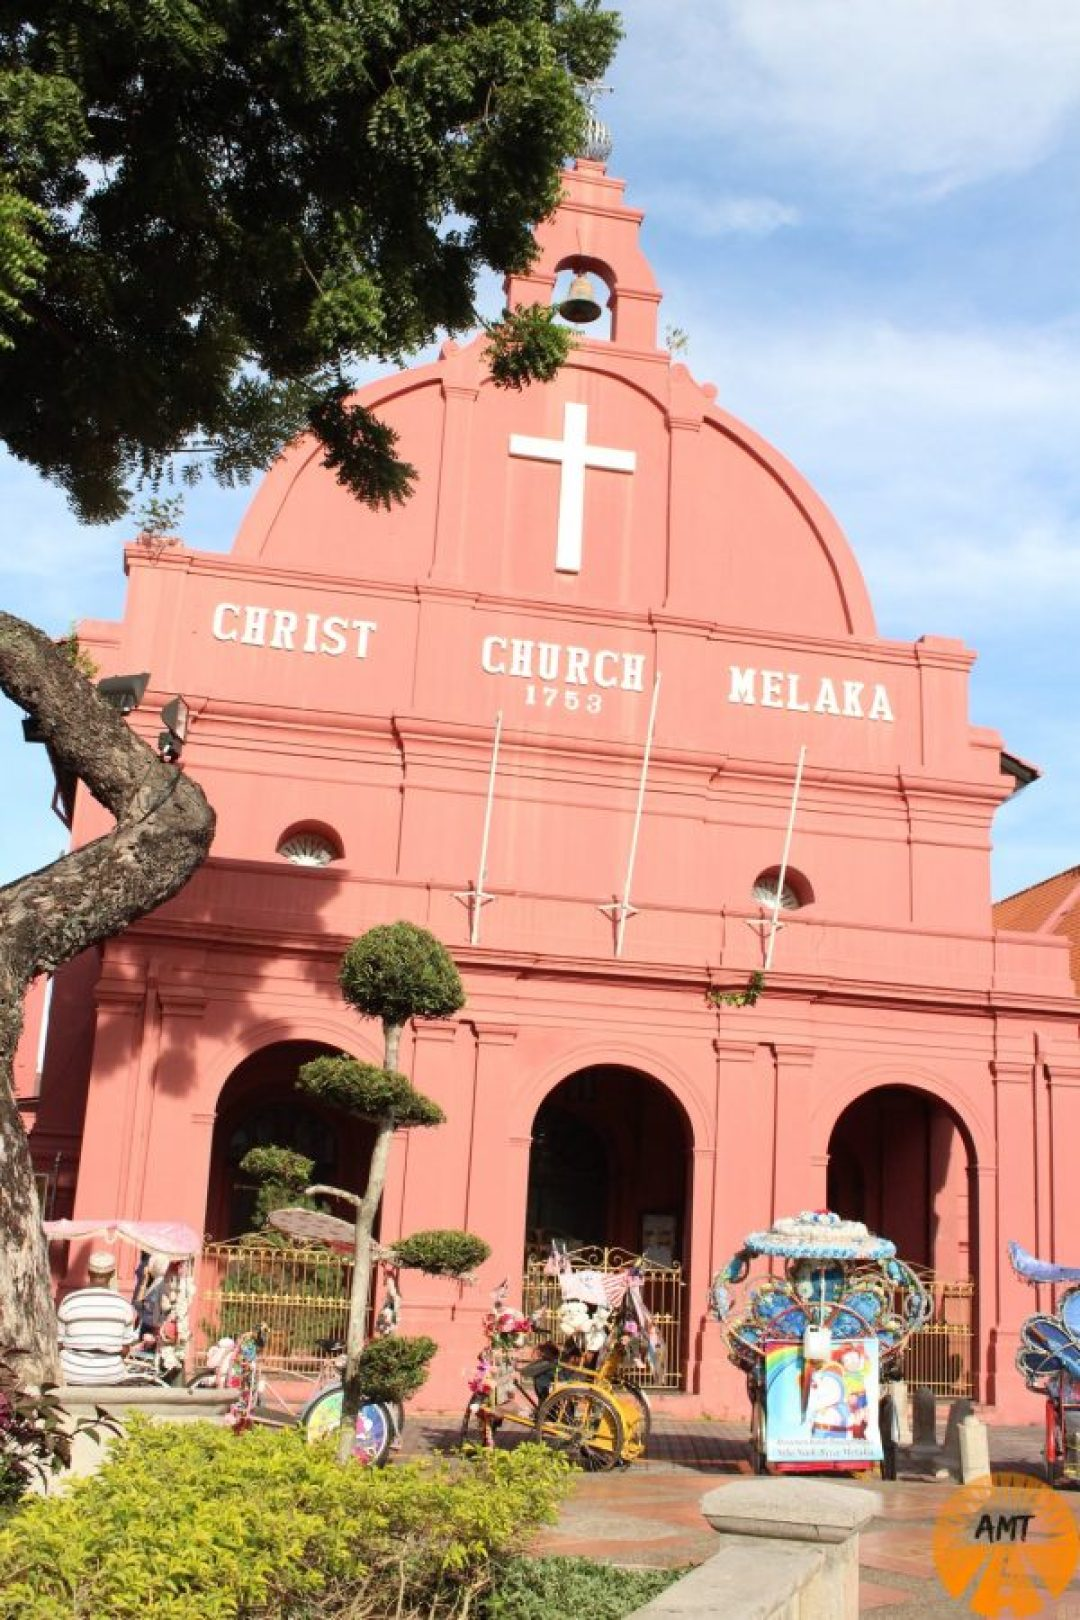 Chiesa di Cristo, Melaka, Malesia